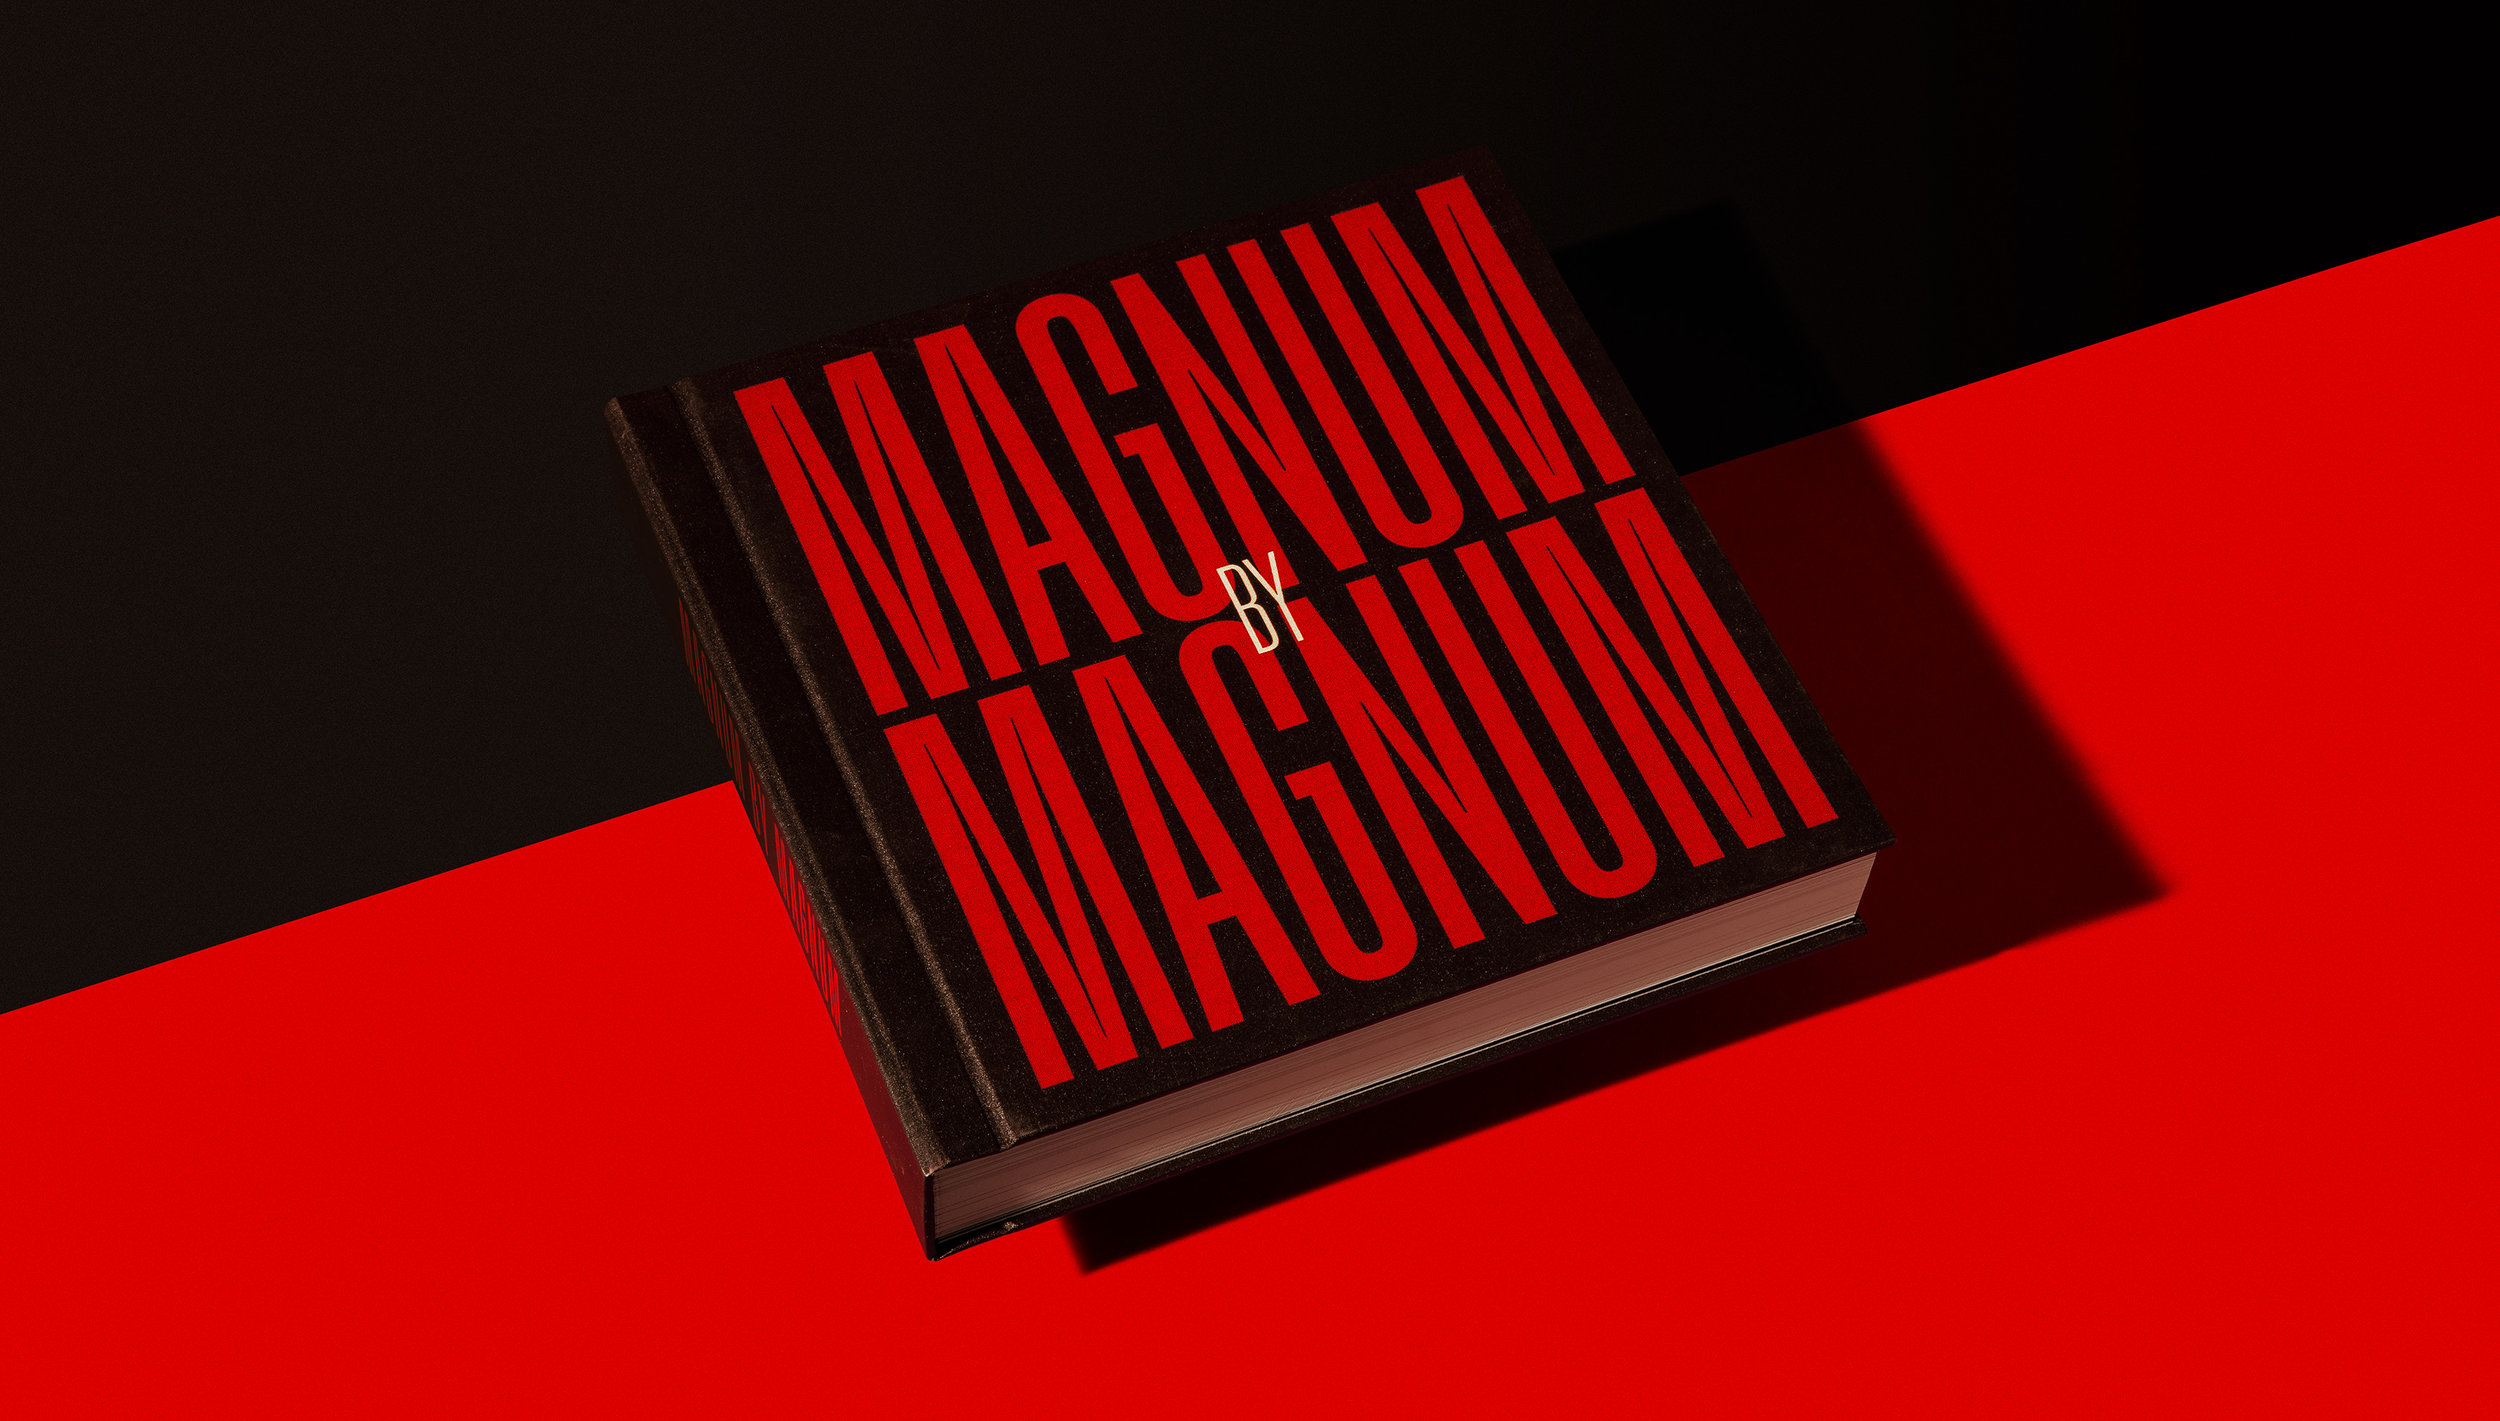 magnum-by-magnum-book1.jpg